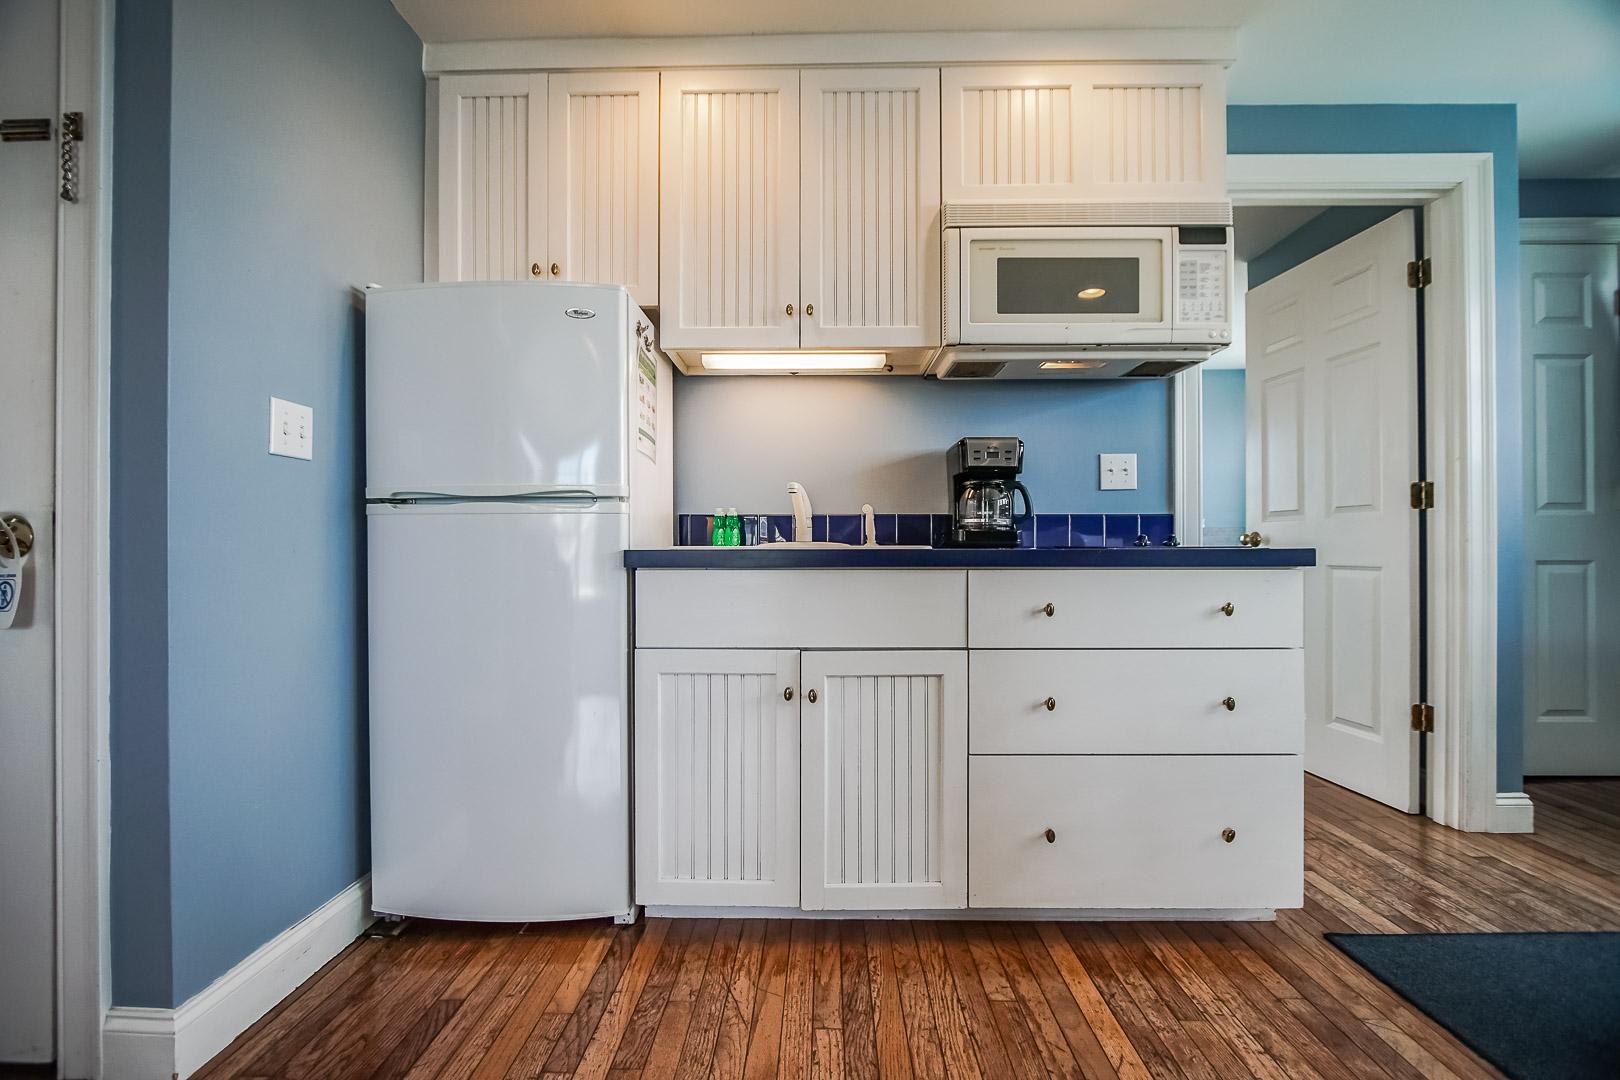 A standard kitchenette at VRI's Beachside Village Resort in Massachusetts.